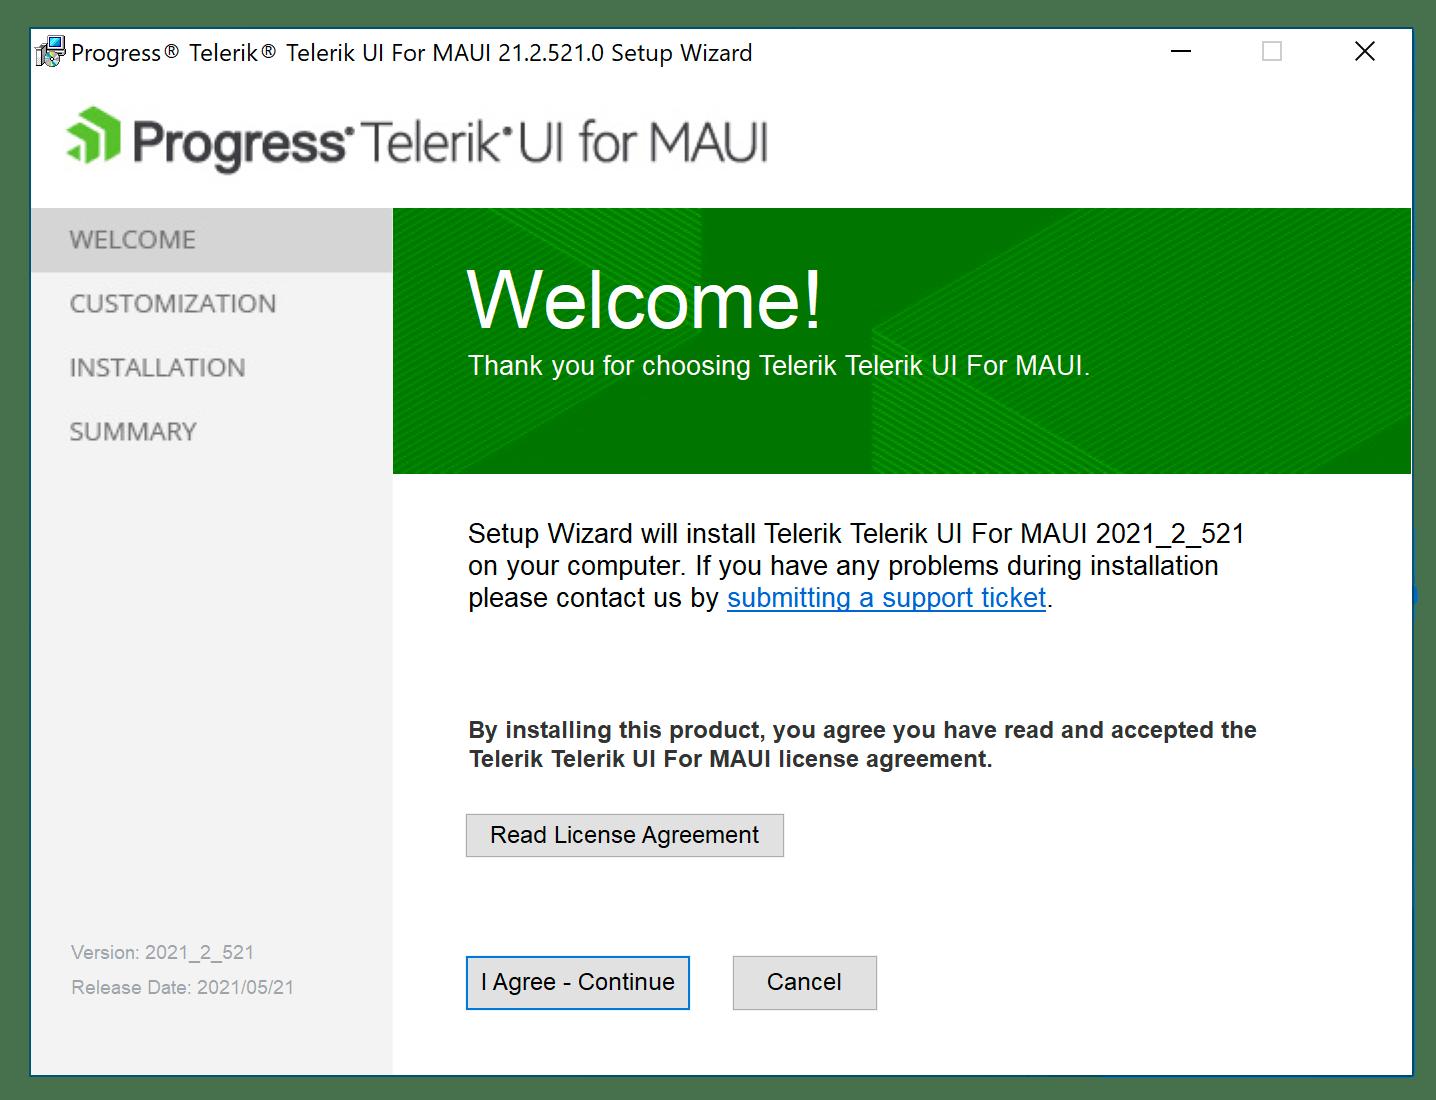 Windows Installer- Progress Telerik UI for MAUI setup wizard. Step one: Welcome! Thank you for choosing Telerik UI for MAUI. License agreement.